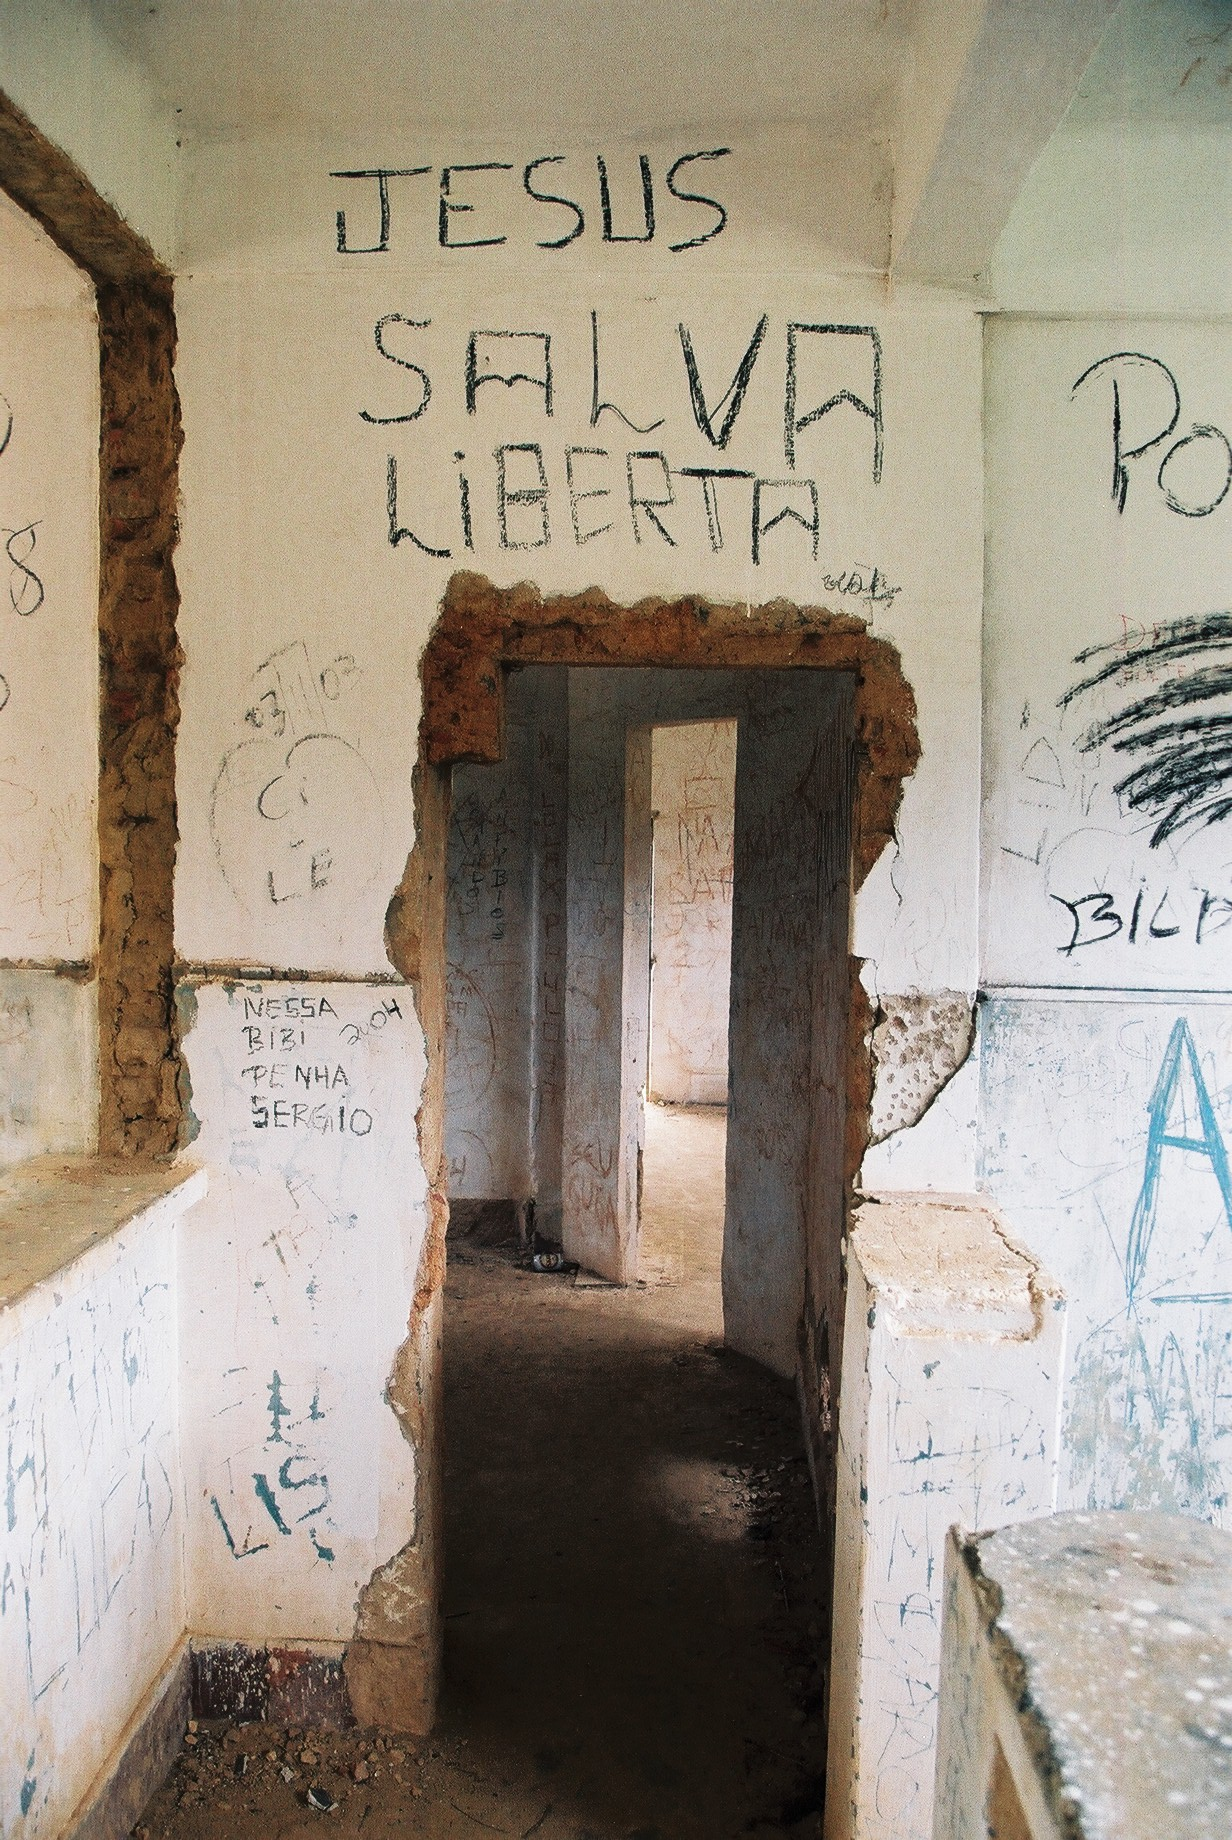 Jesus Salva Liberta, Dos Rios Prison.JPG